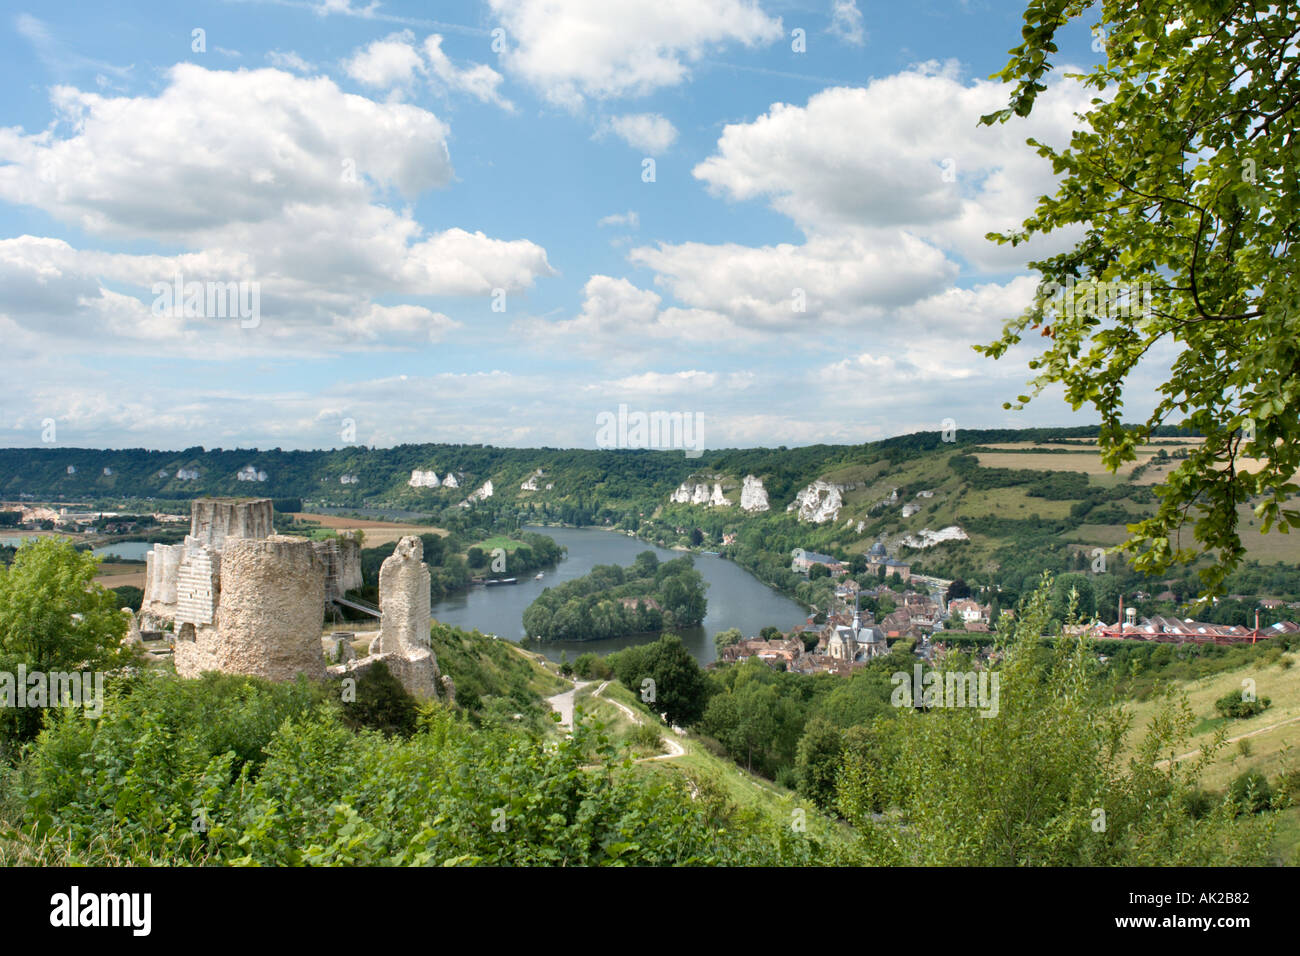 Chateau Gaillard, Les Andelys, Normandy ,France - Stock Image